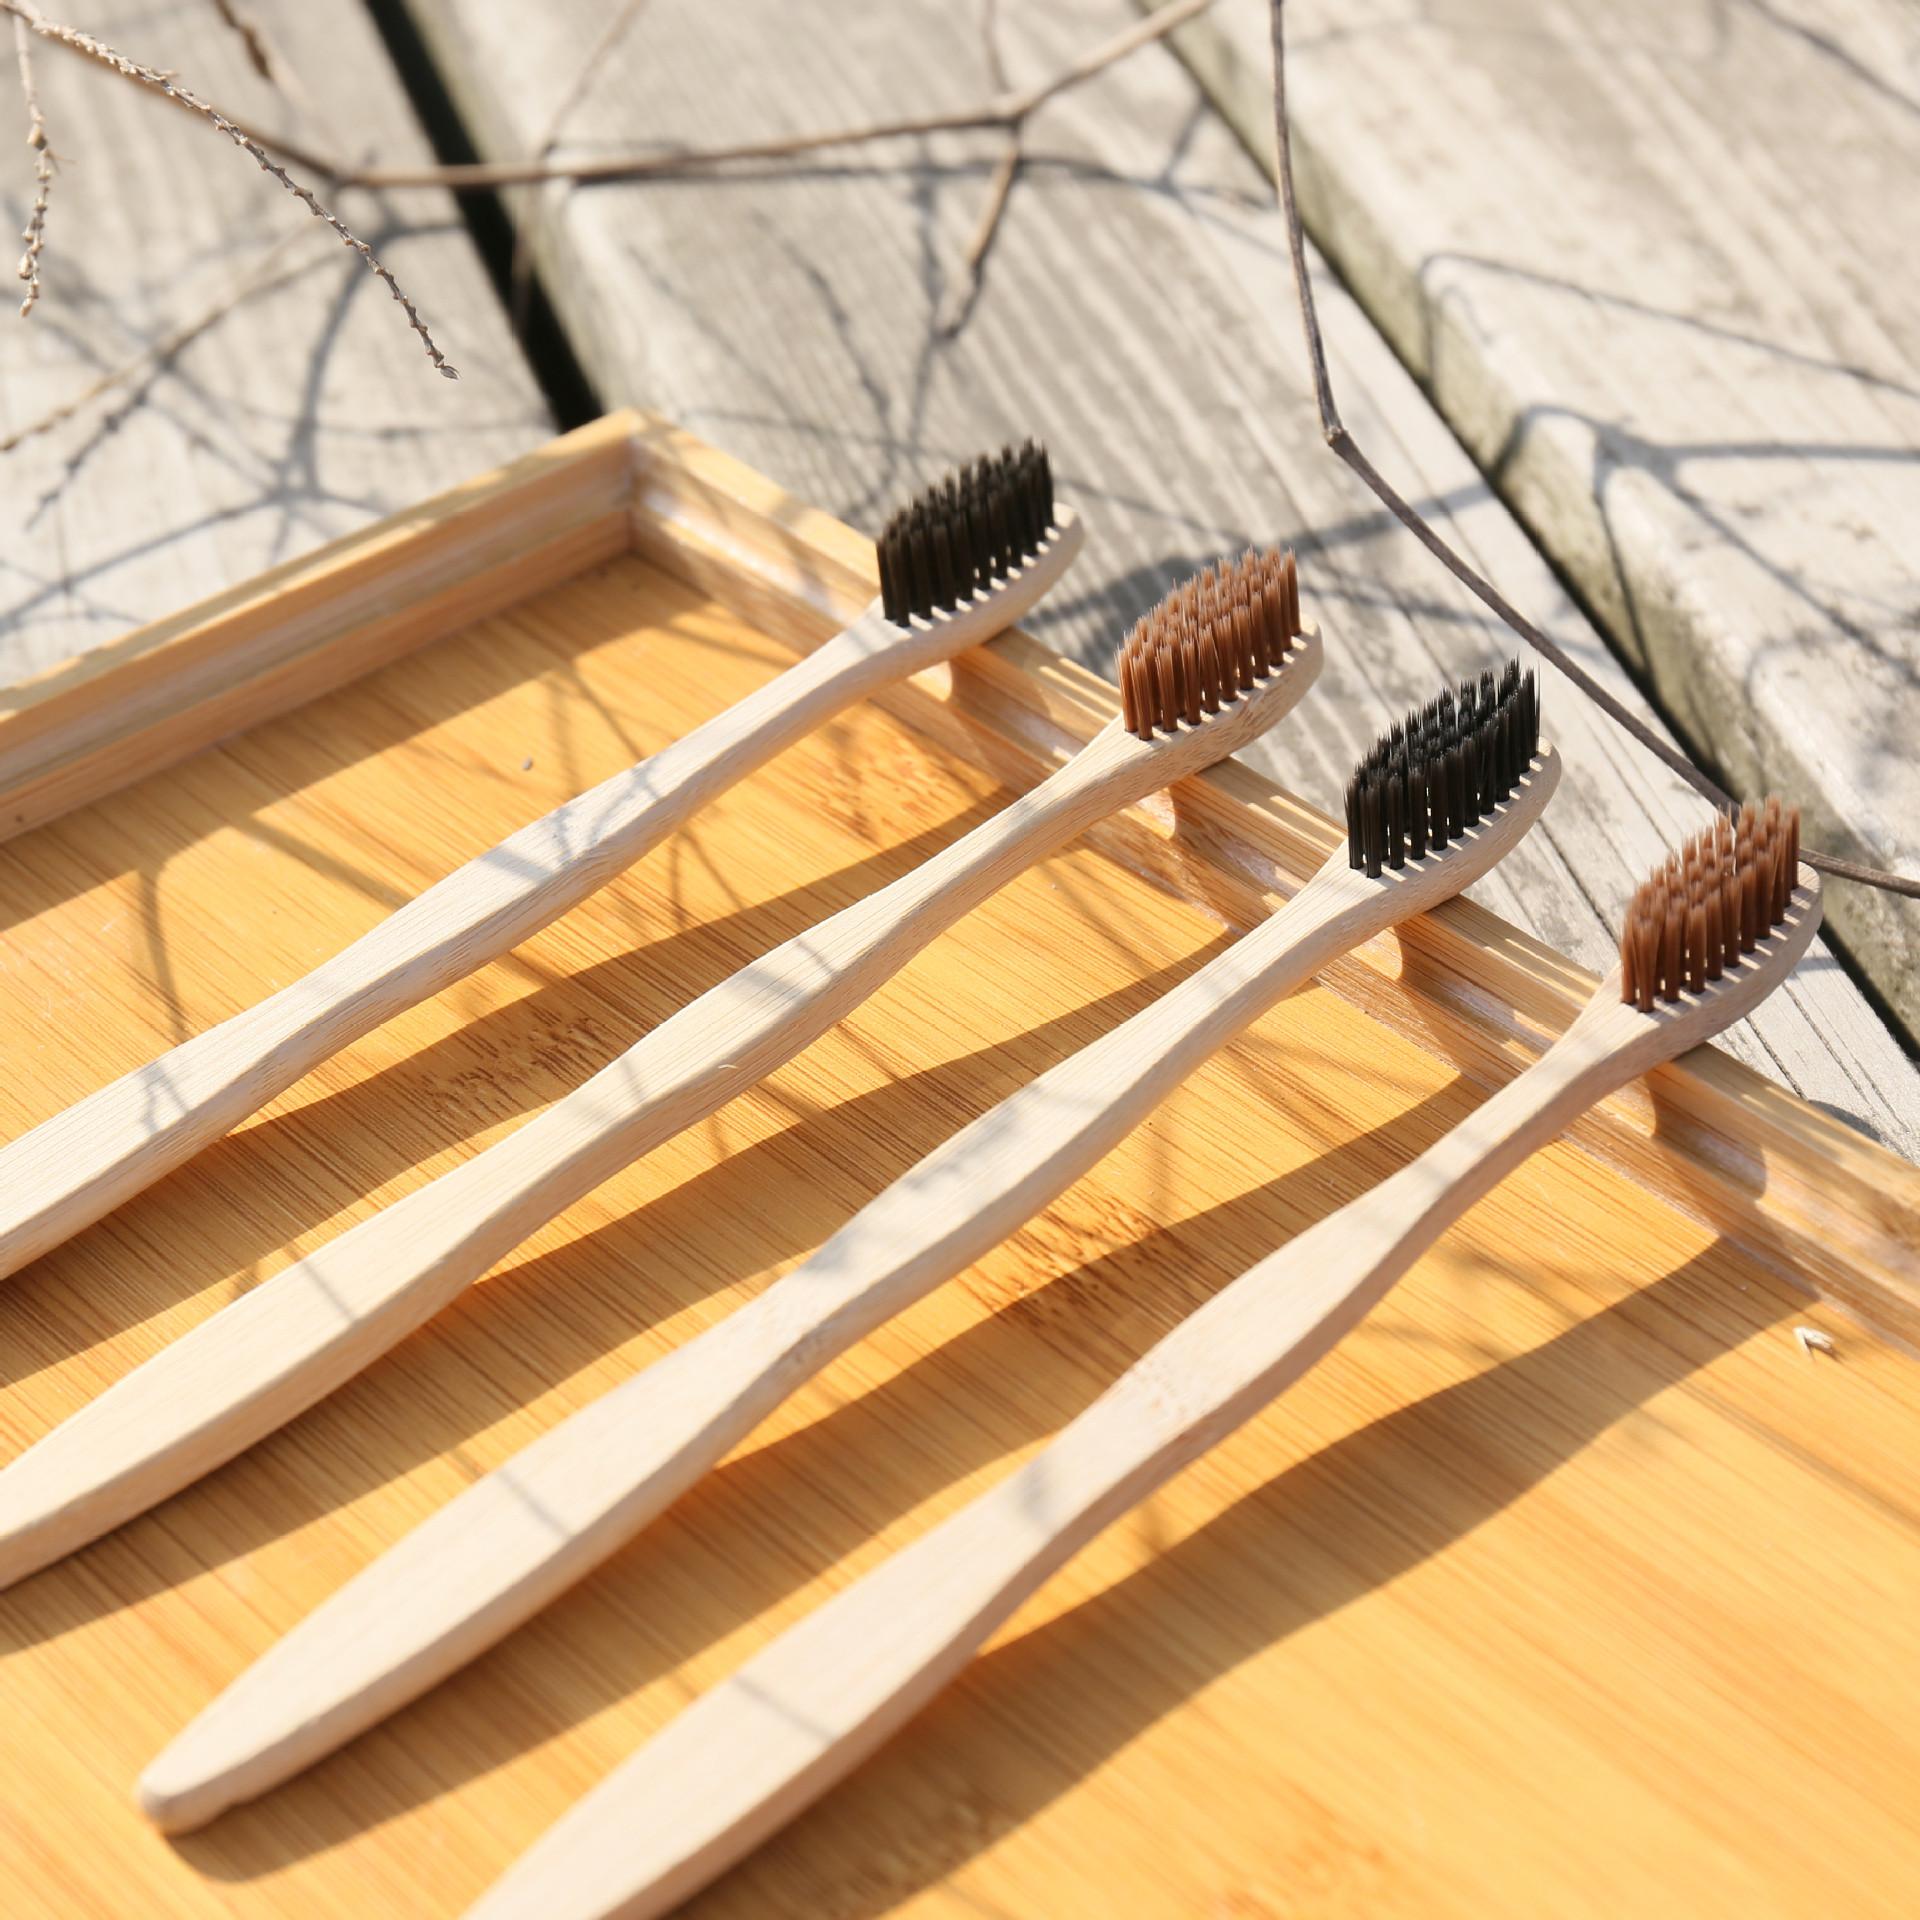 Natural Organic Bamboo Toothbrush Eco-Friendly Wood